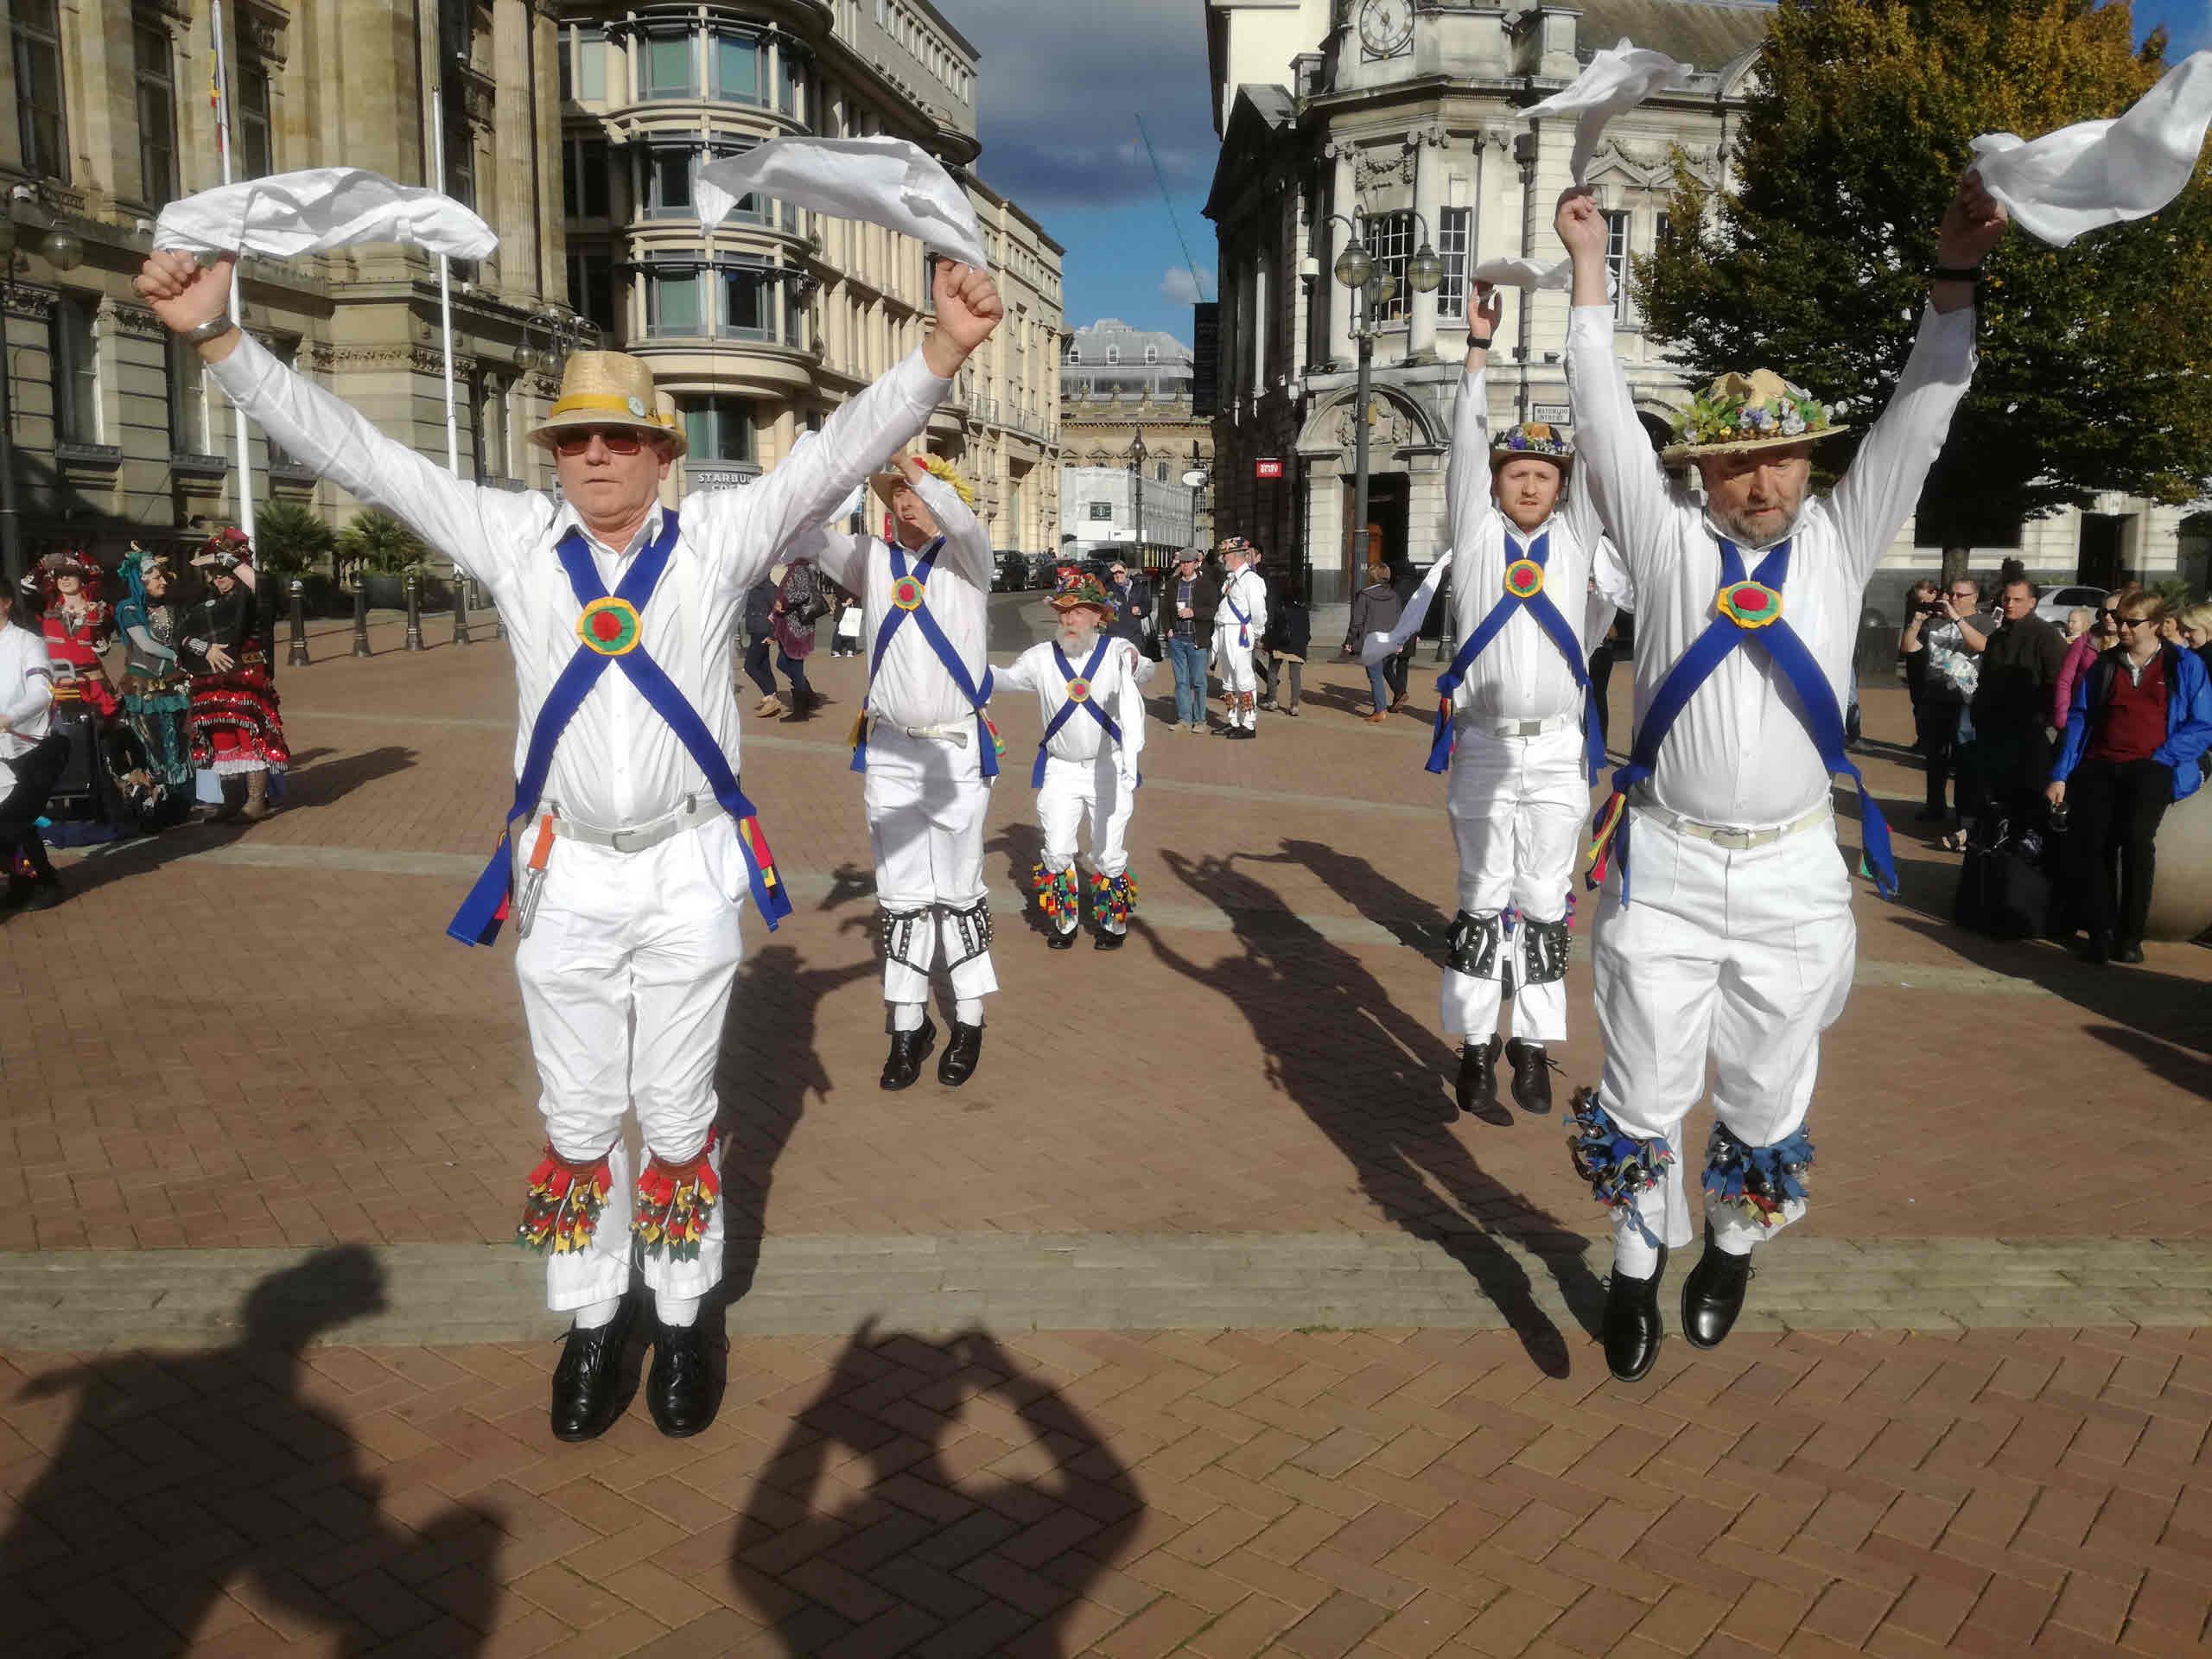 Dancing in Centenary Square - October 2016